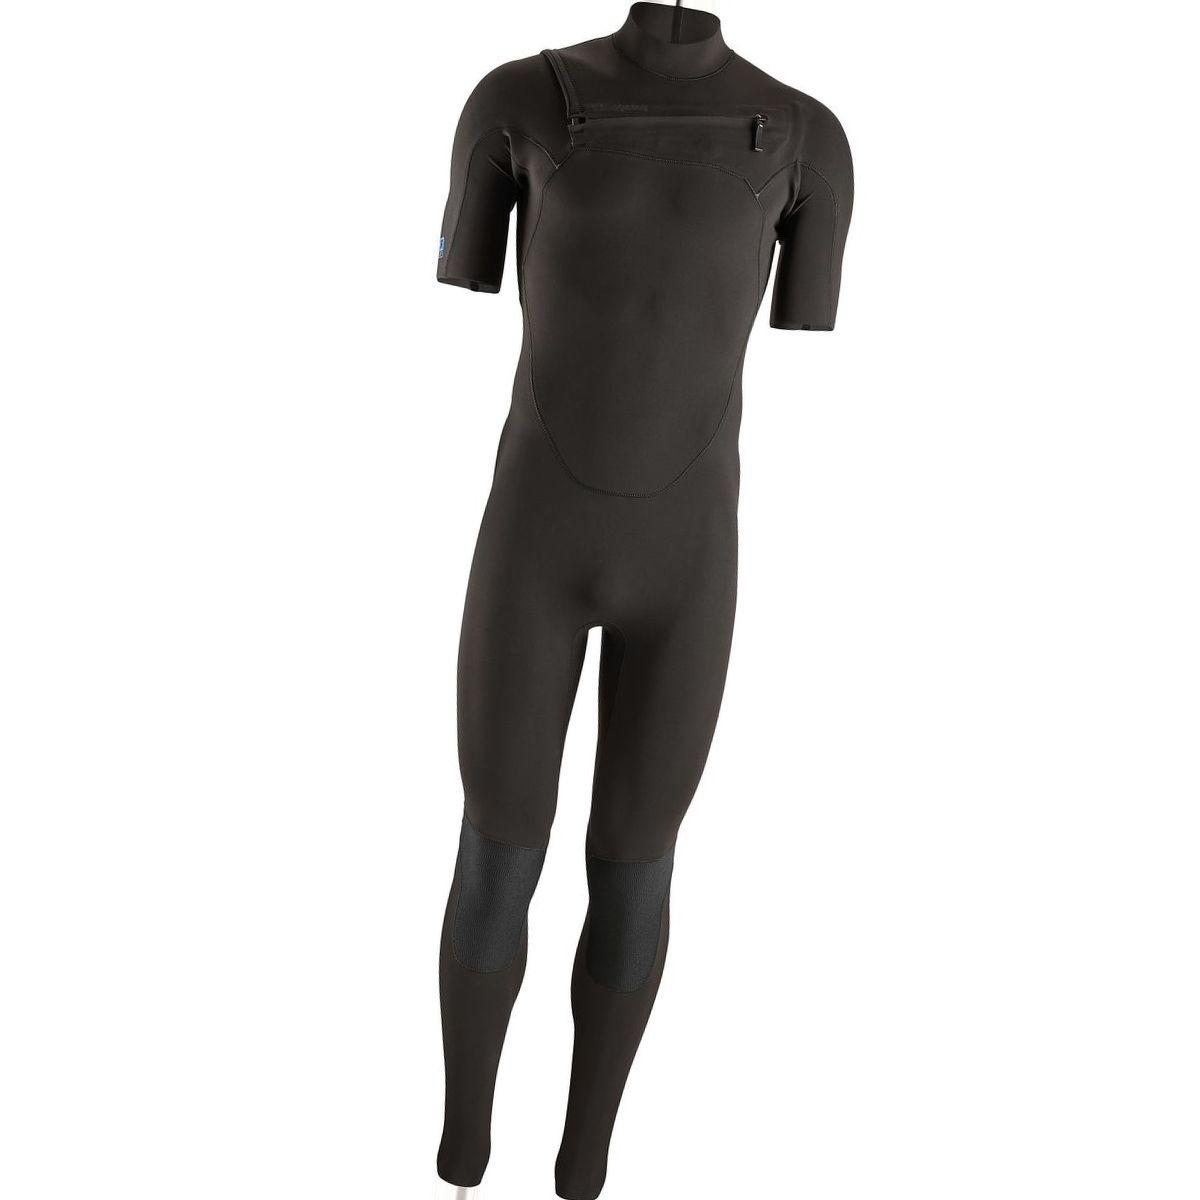 Patagonia R1 Lite Yulex Front-Zip Short-Sleeve Wetsuit - Men's